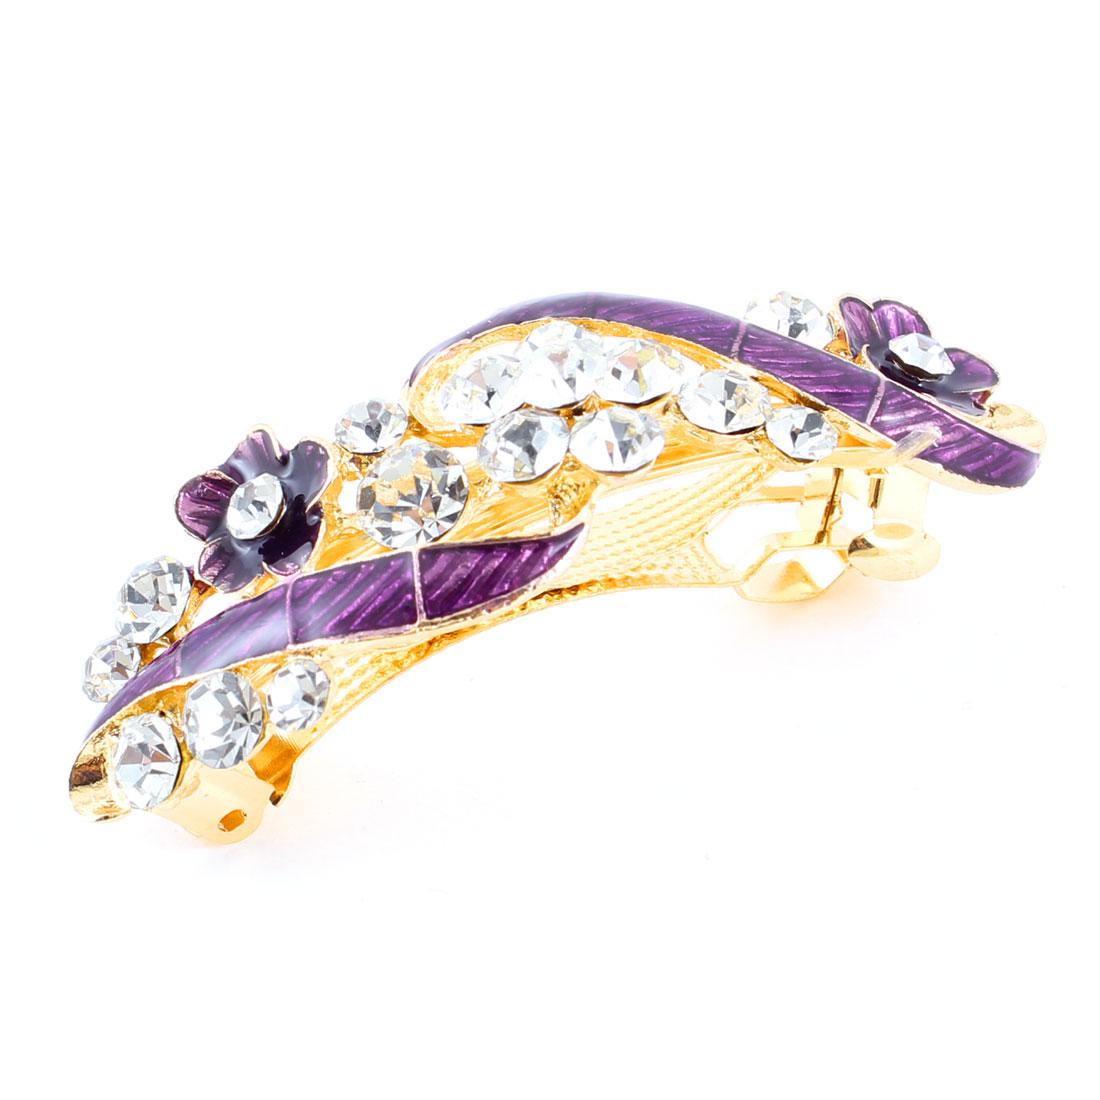 Woman Girl Purple Flower Design Shiny Rhinestone Barrette Hairpin